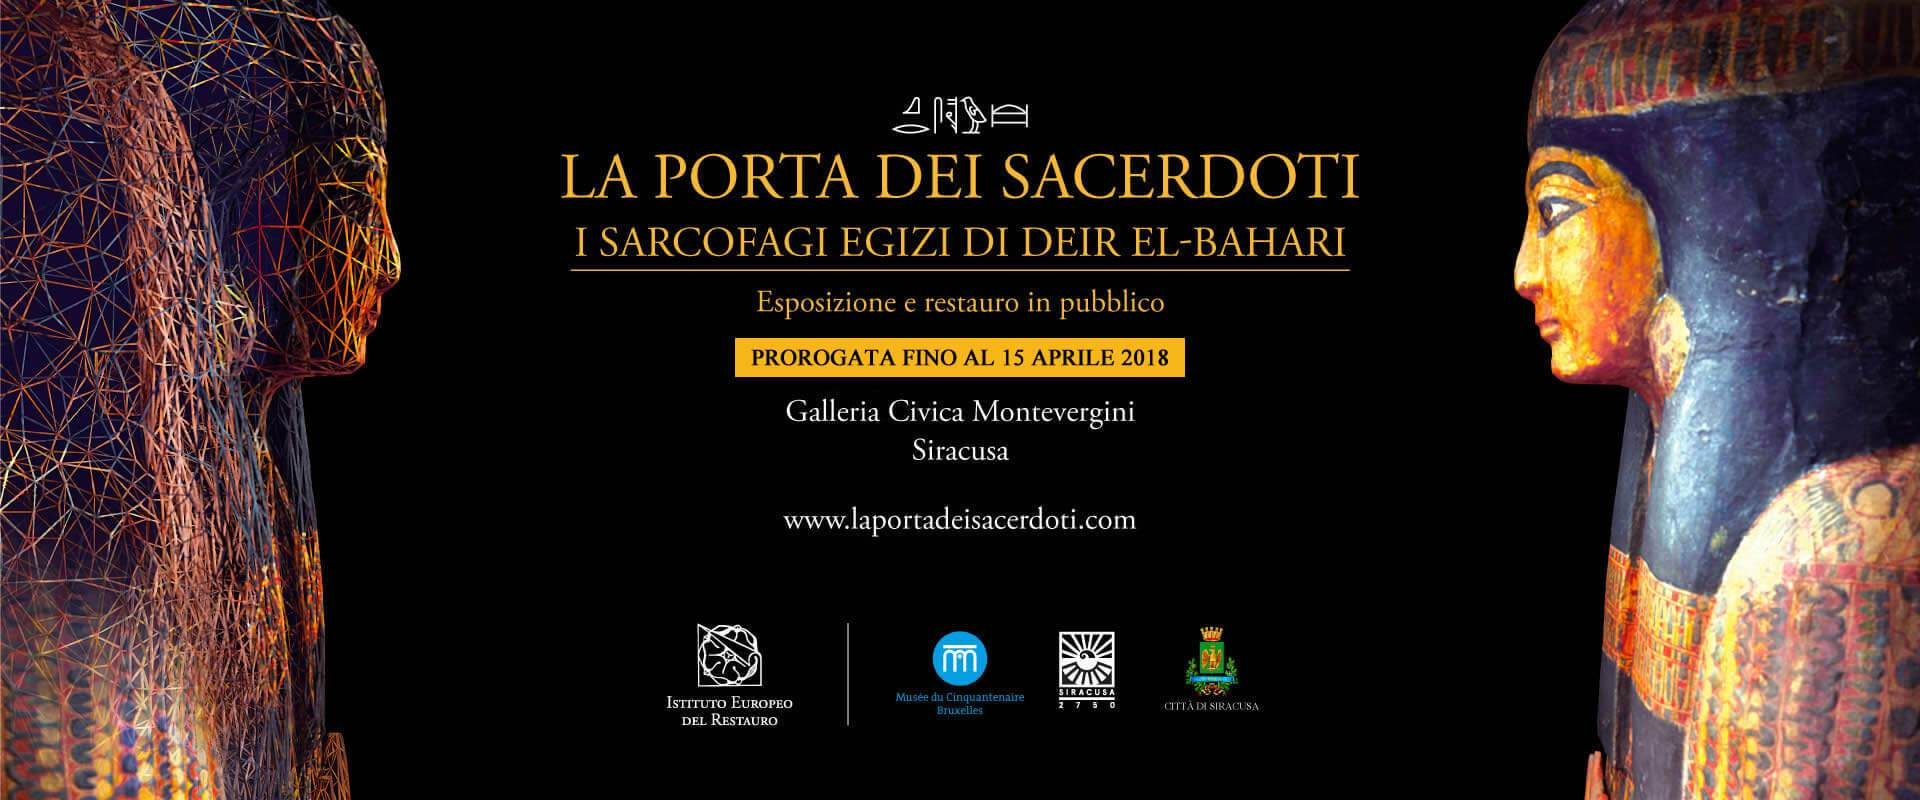 La Porta dei Sacerdoti. I sarcofagi egizi Deir El-Bahari. Galleria Civica Montevergini. Siracusa